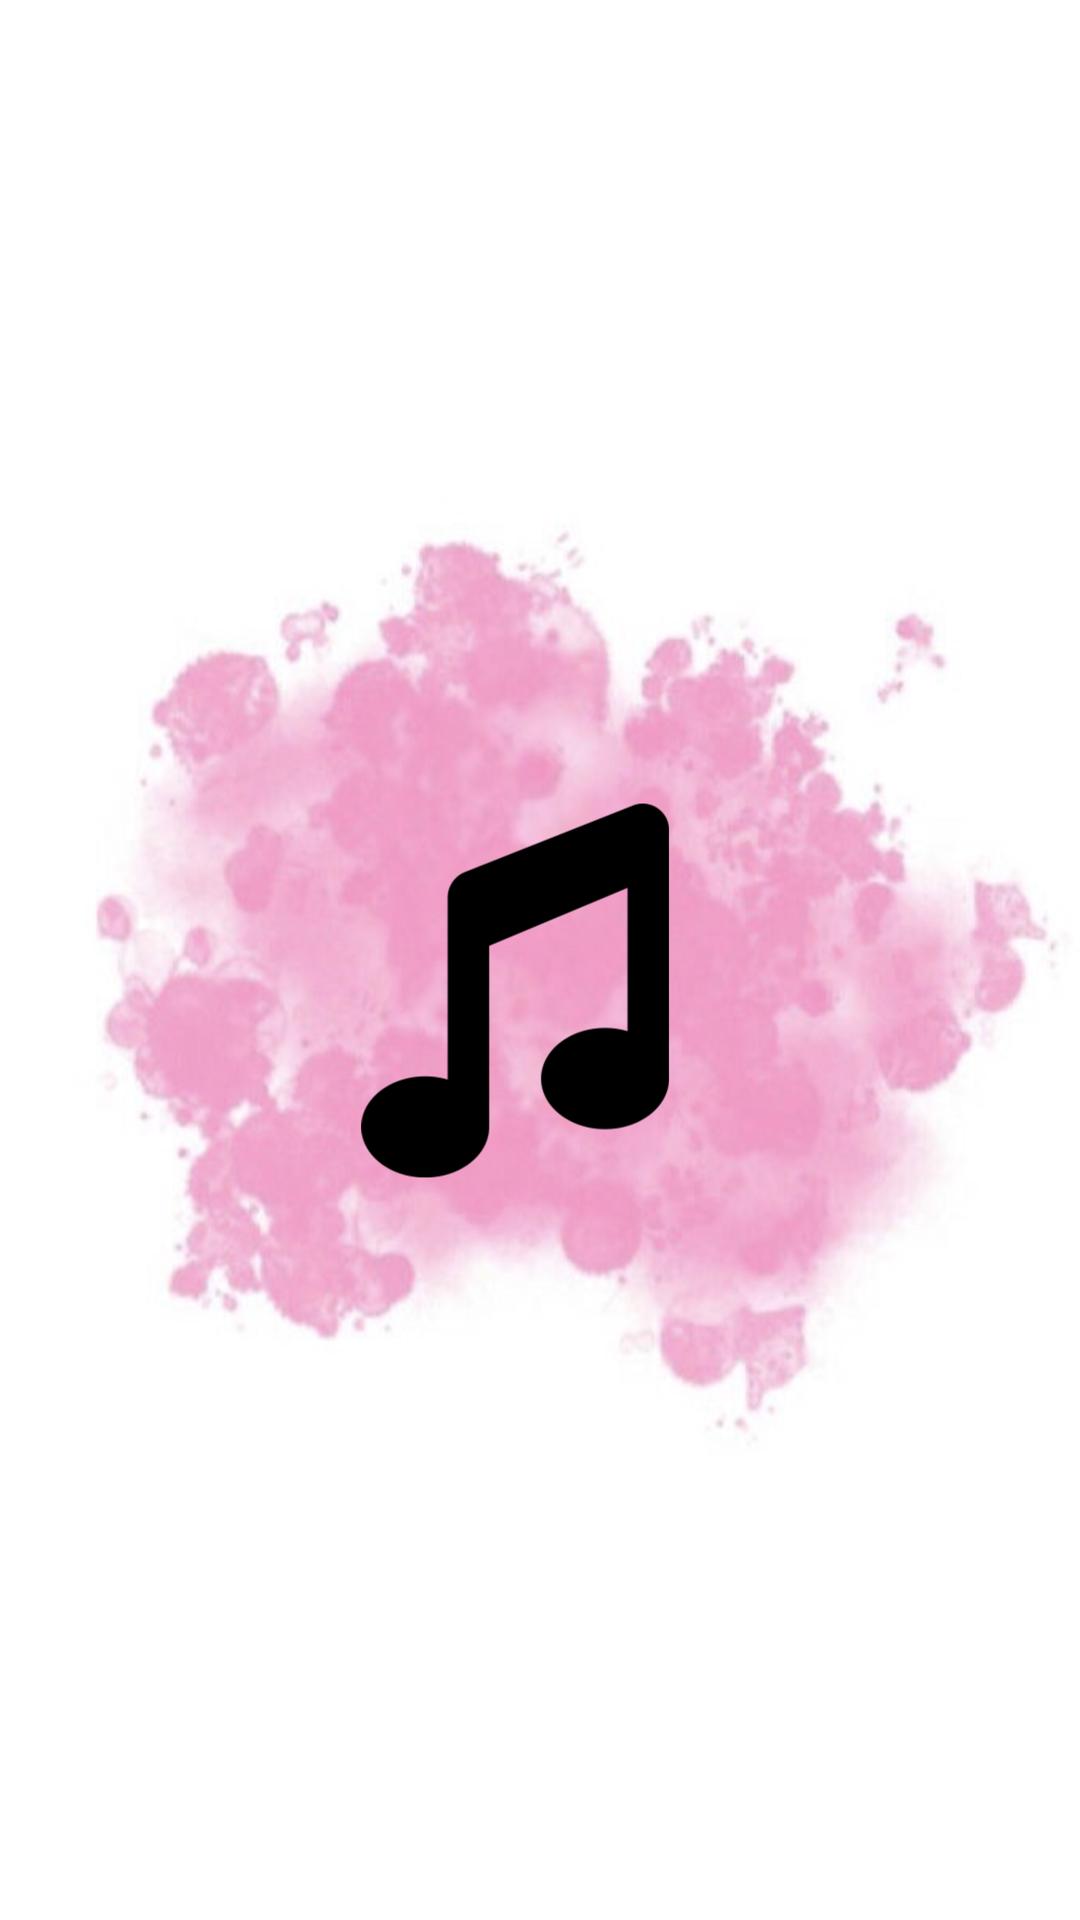 Pin de Rainbow and Salt em icons Logotipo instagram